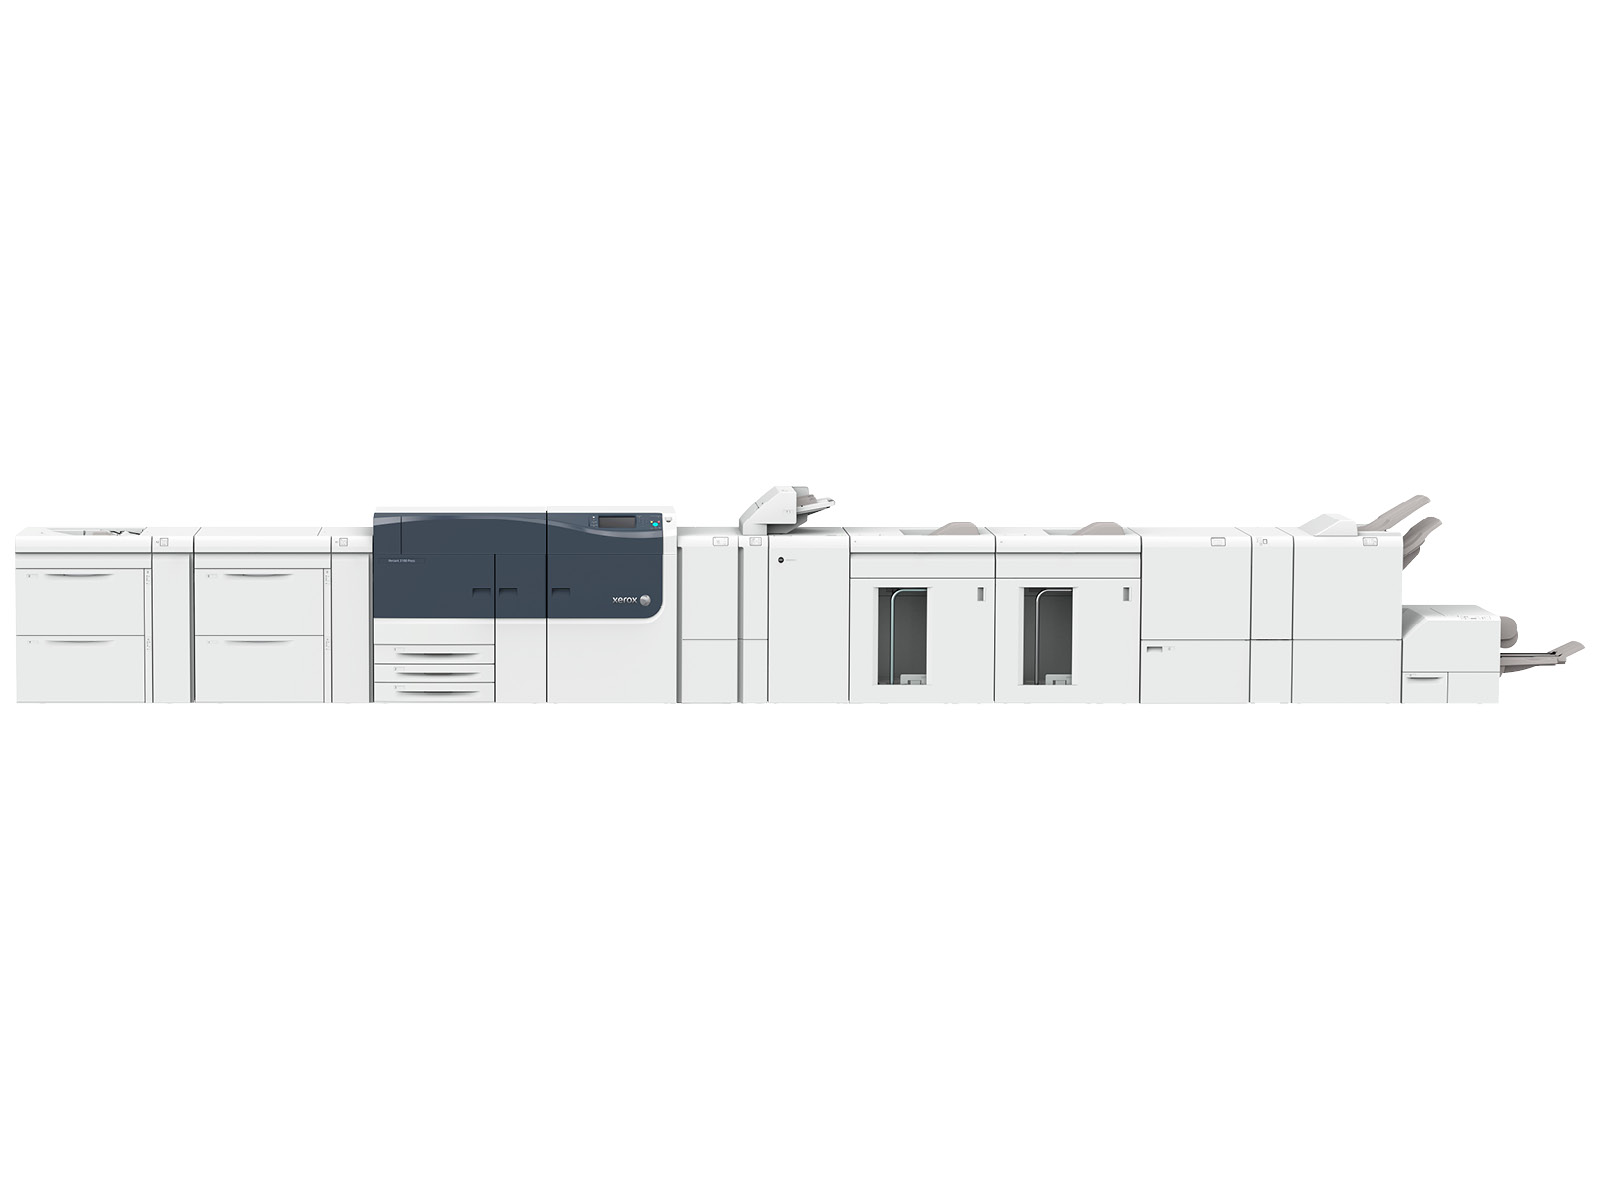 Xerox D136 - Document Network Services Ltd